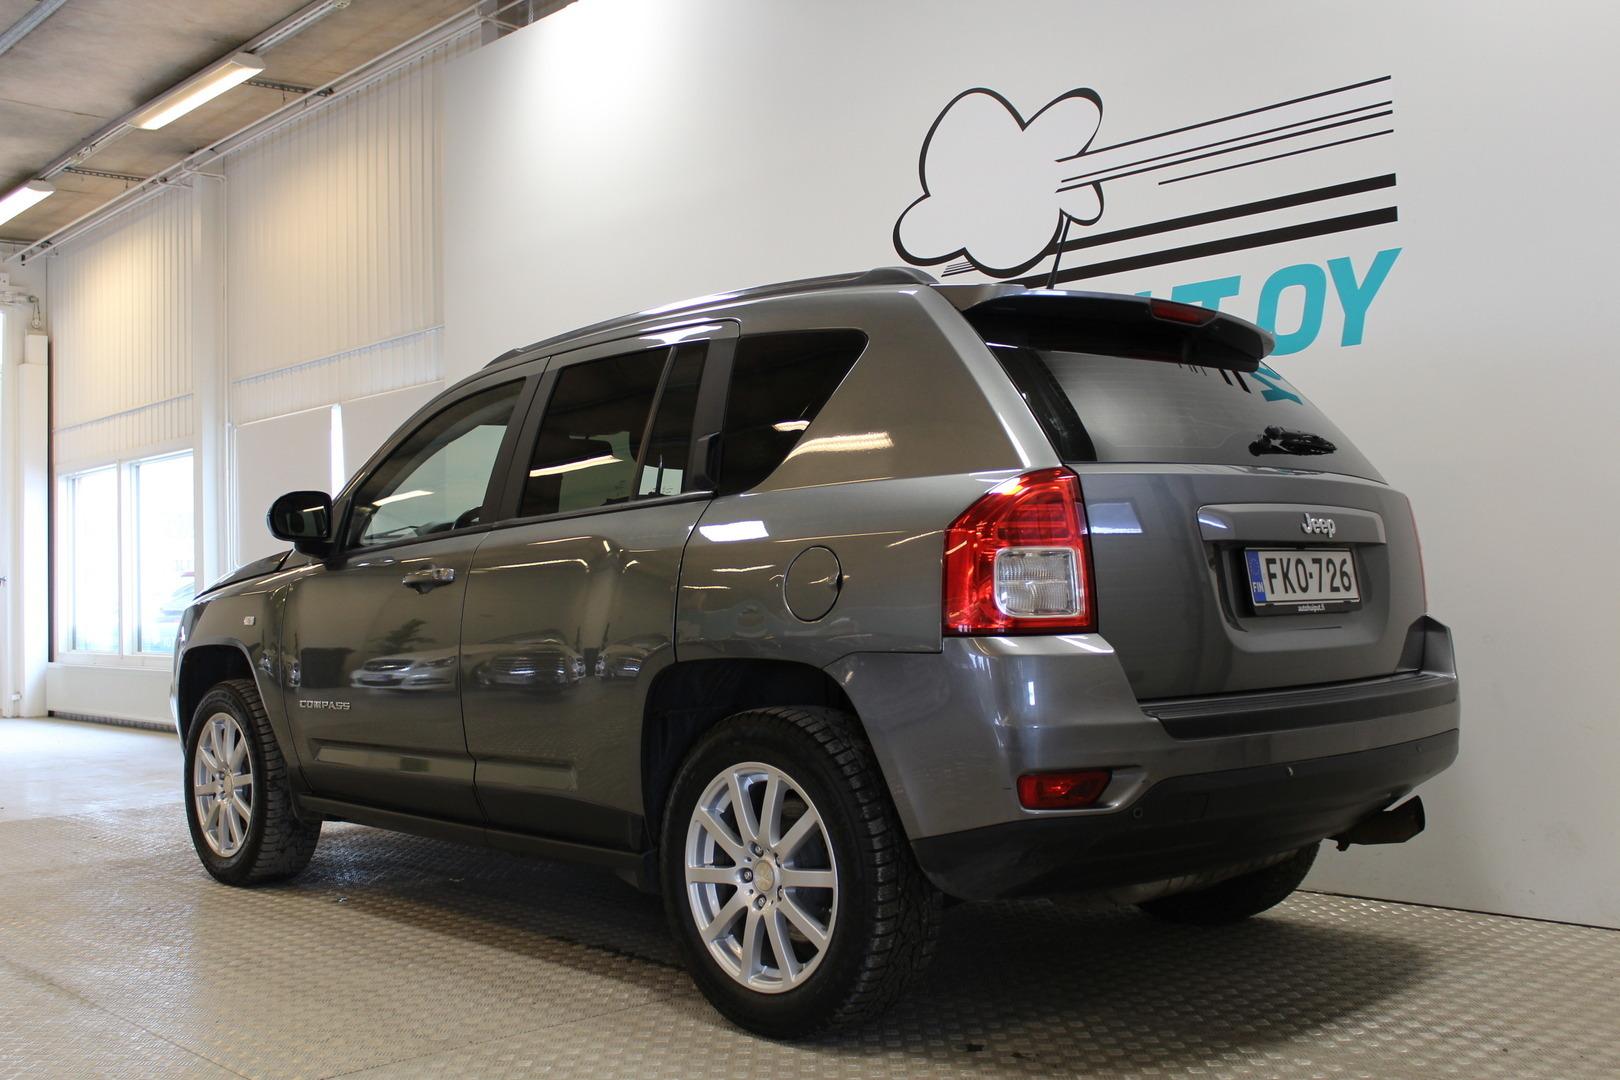 Jeep Compass, 2,0 M5 Sport **Suomi-auto** #Tutkat #Bluetooth